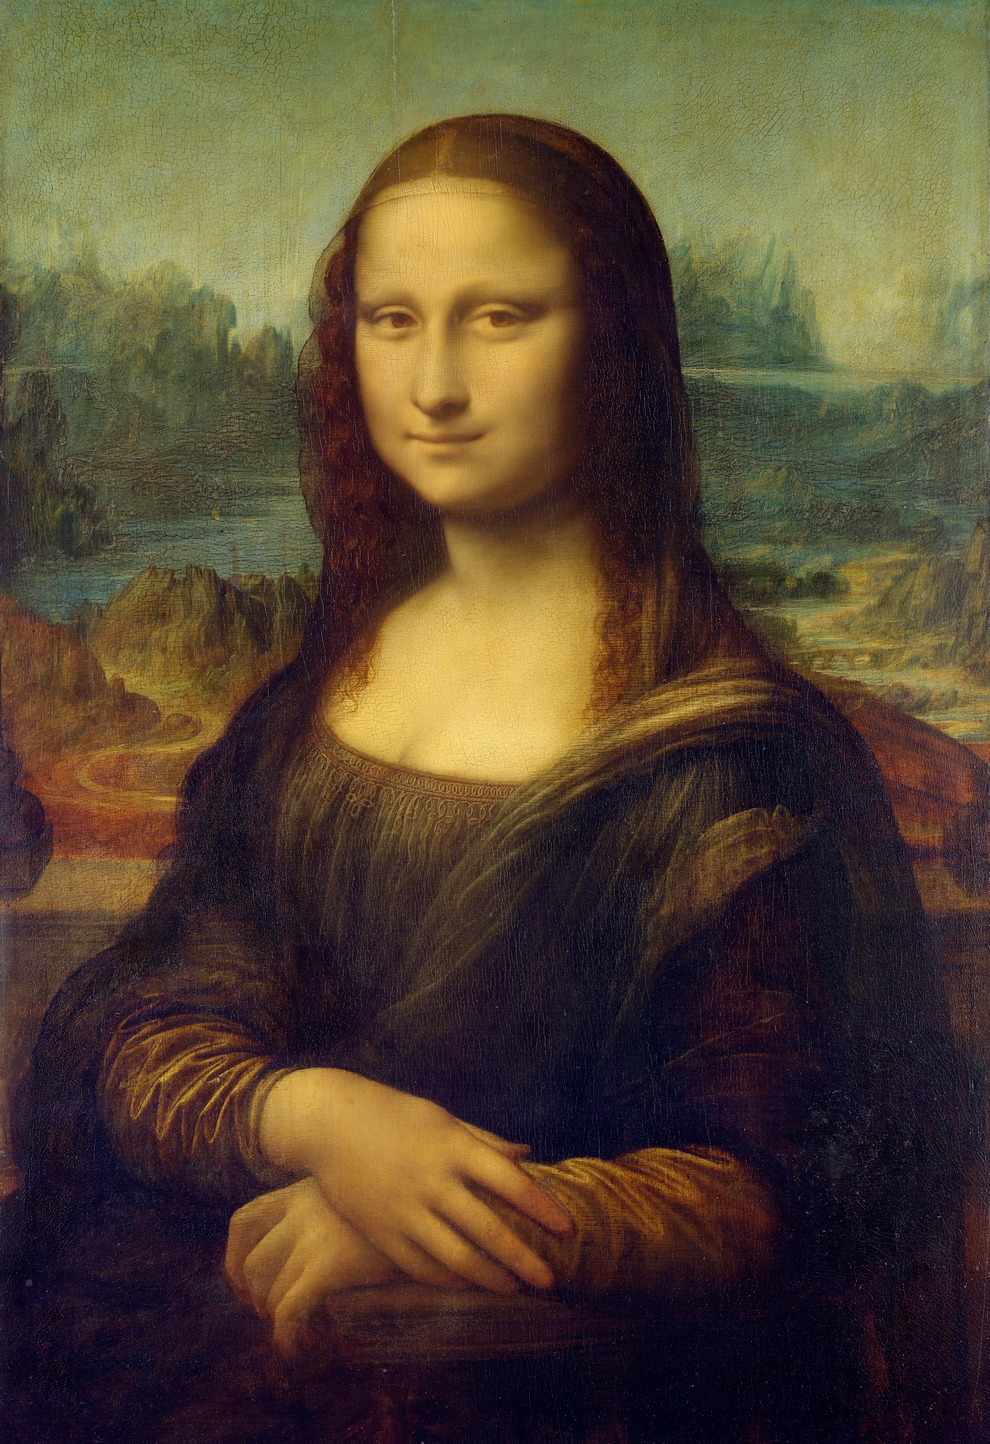 Ostateczna i ubrana wersja Mony Lisy pędzla Leonarda da Vinci.